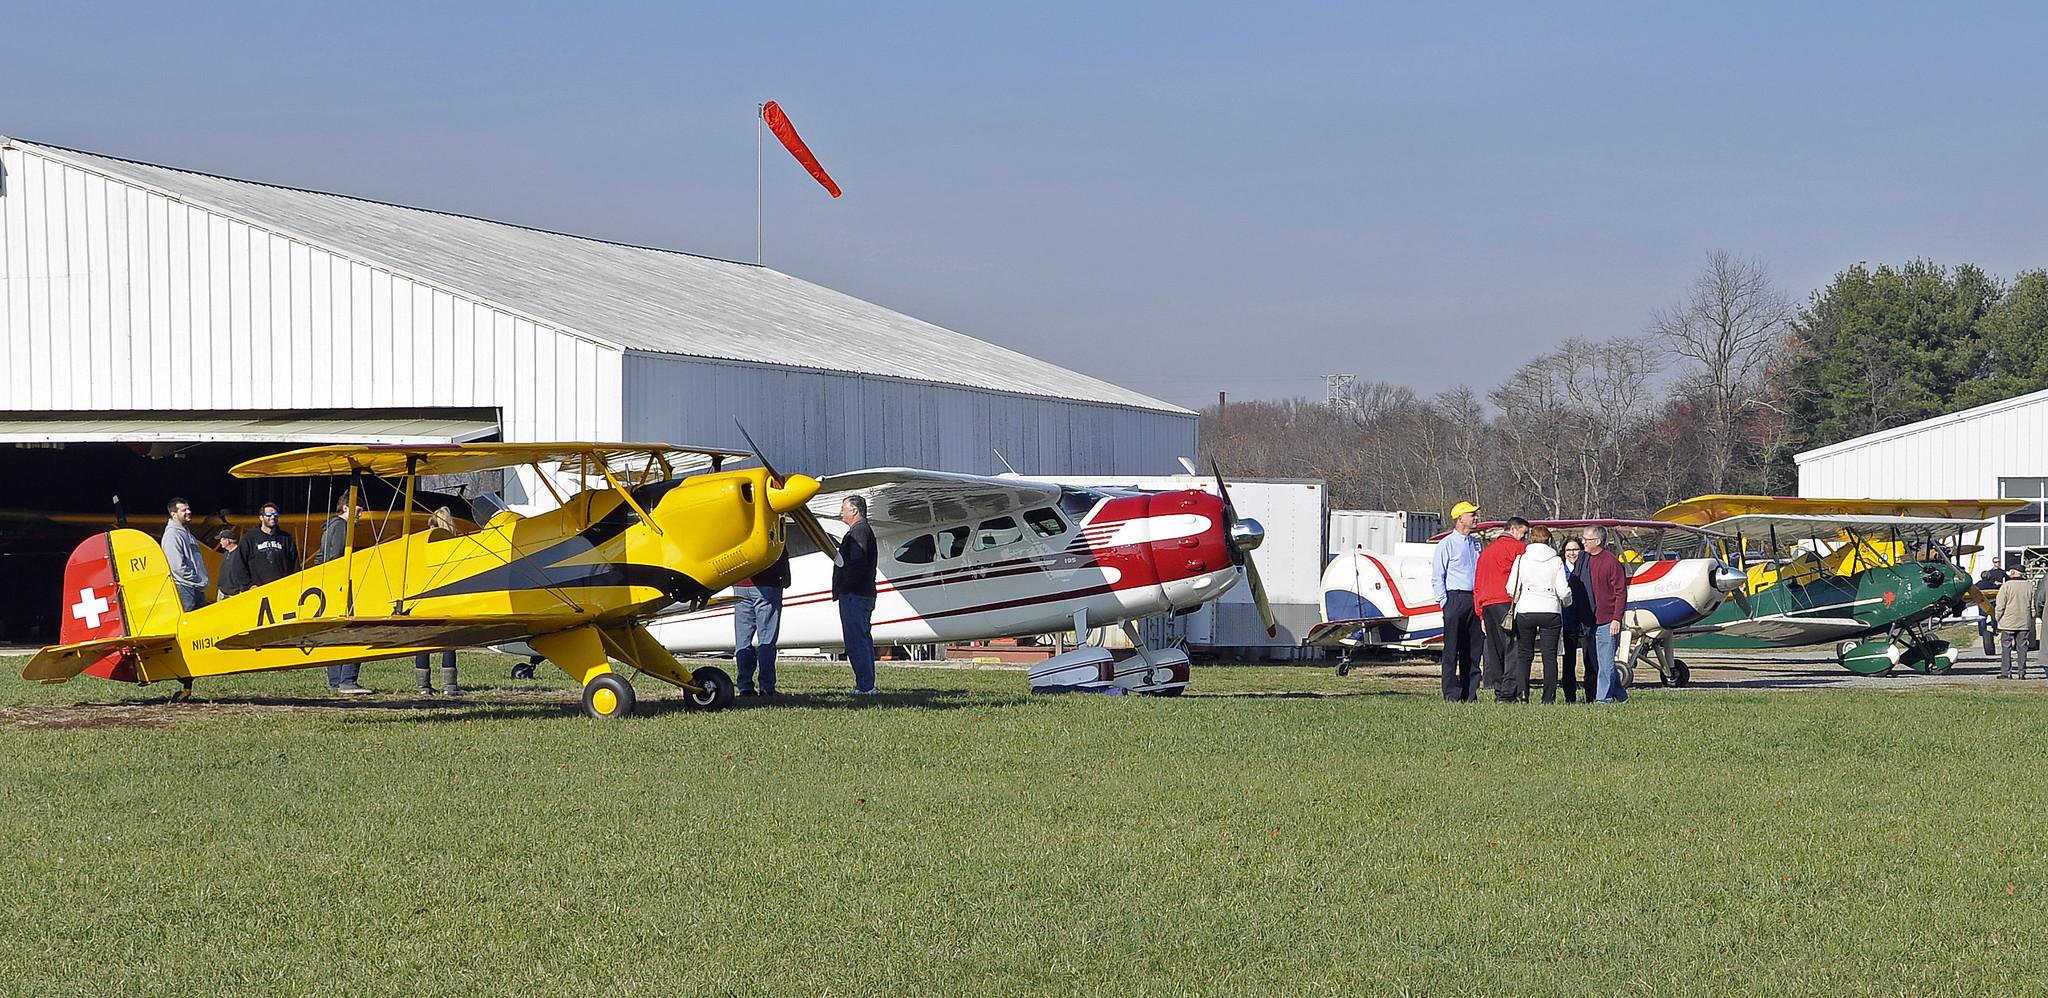 Massey Open Hangar Party & Fly-In